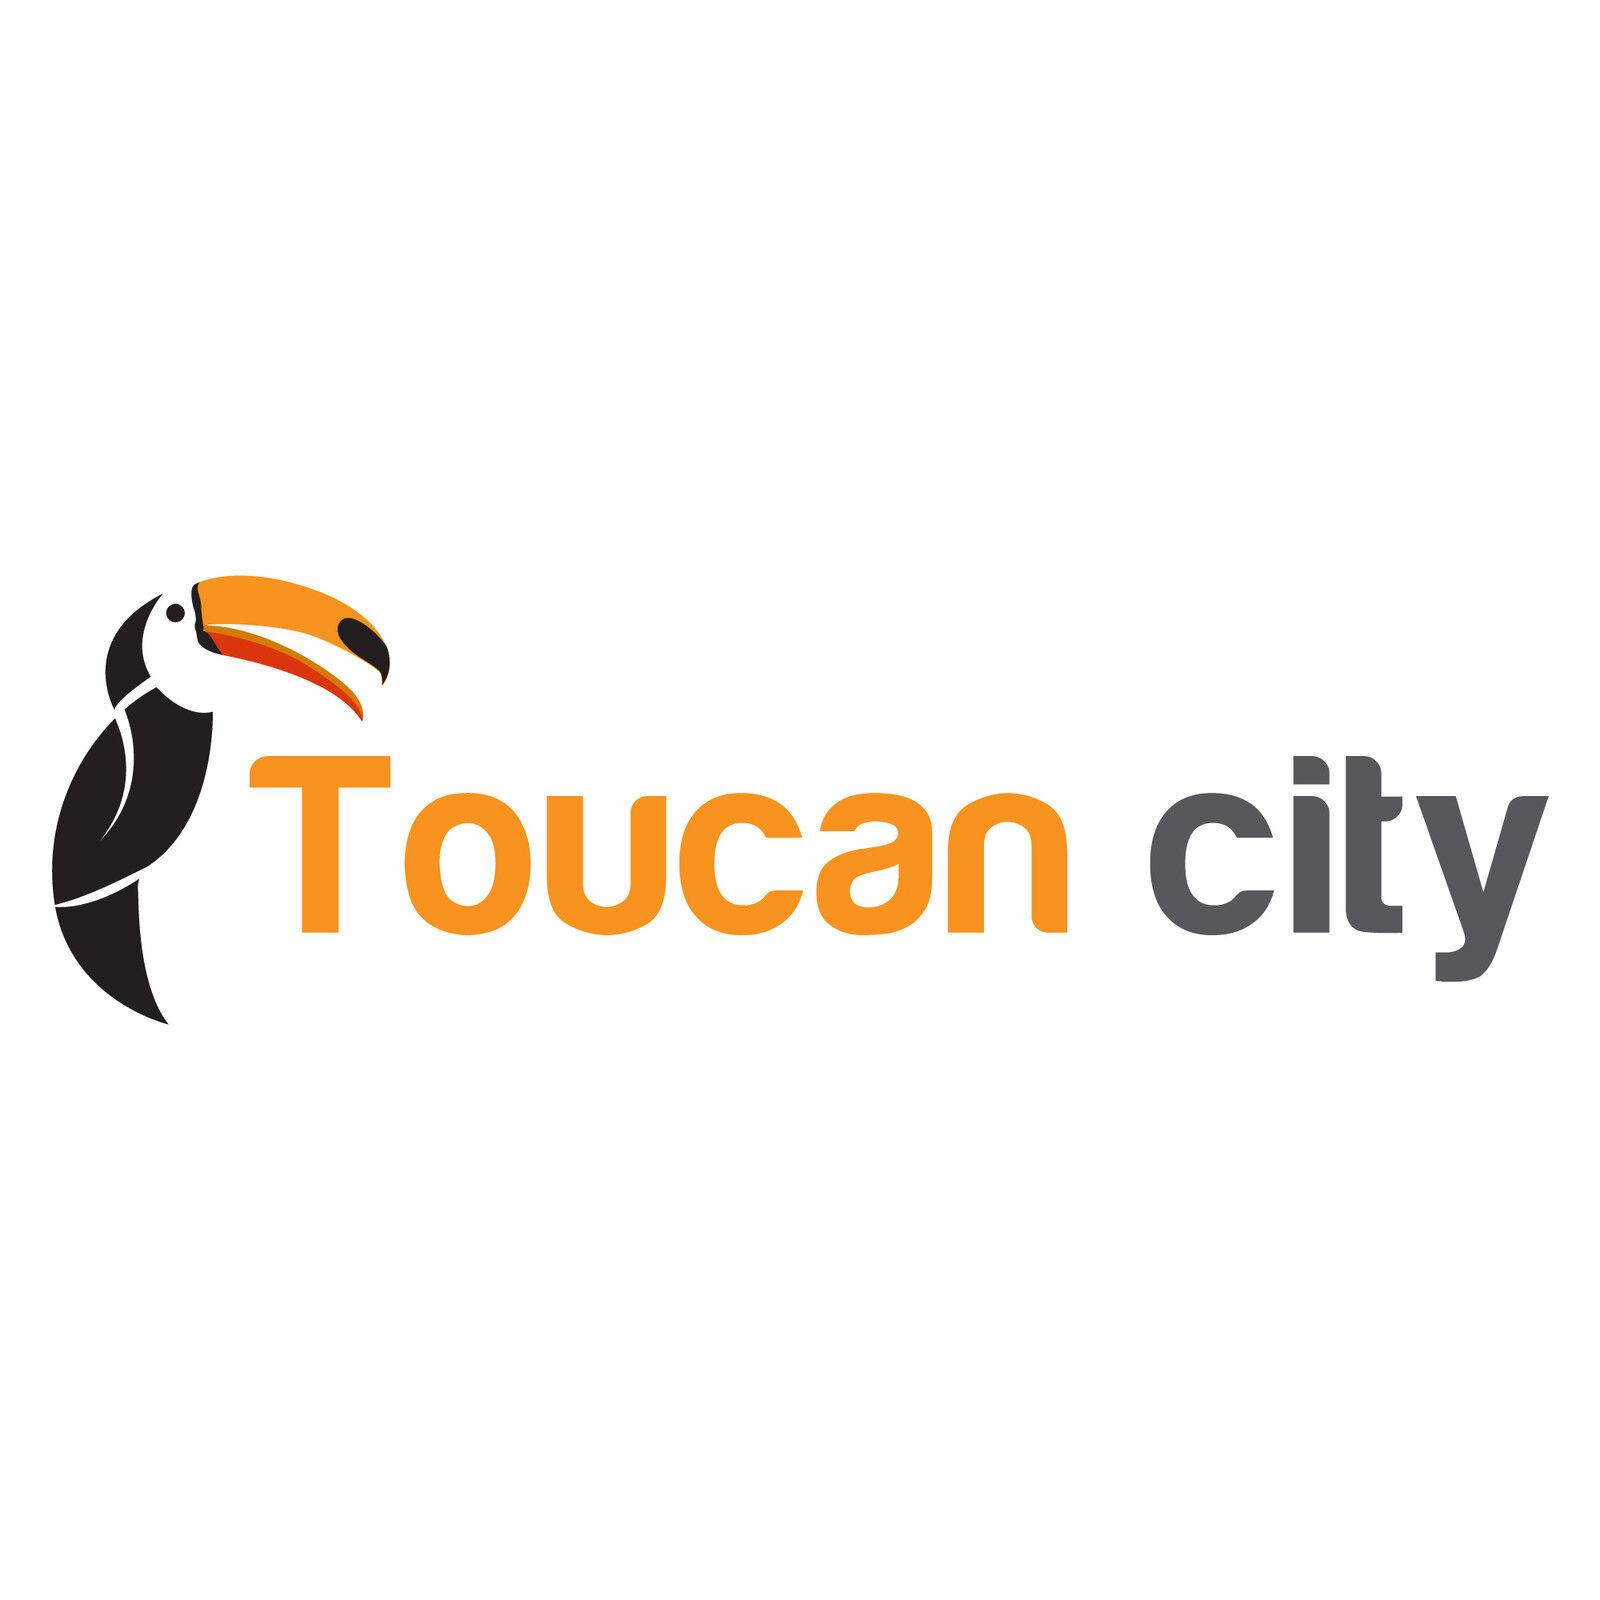 Toucan City